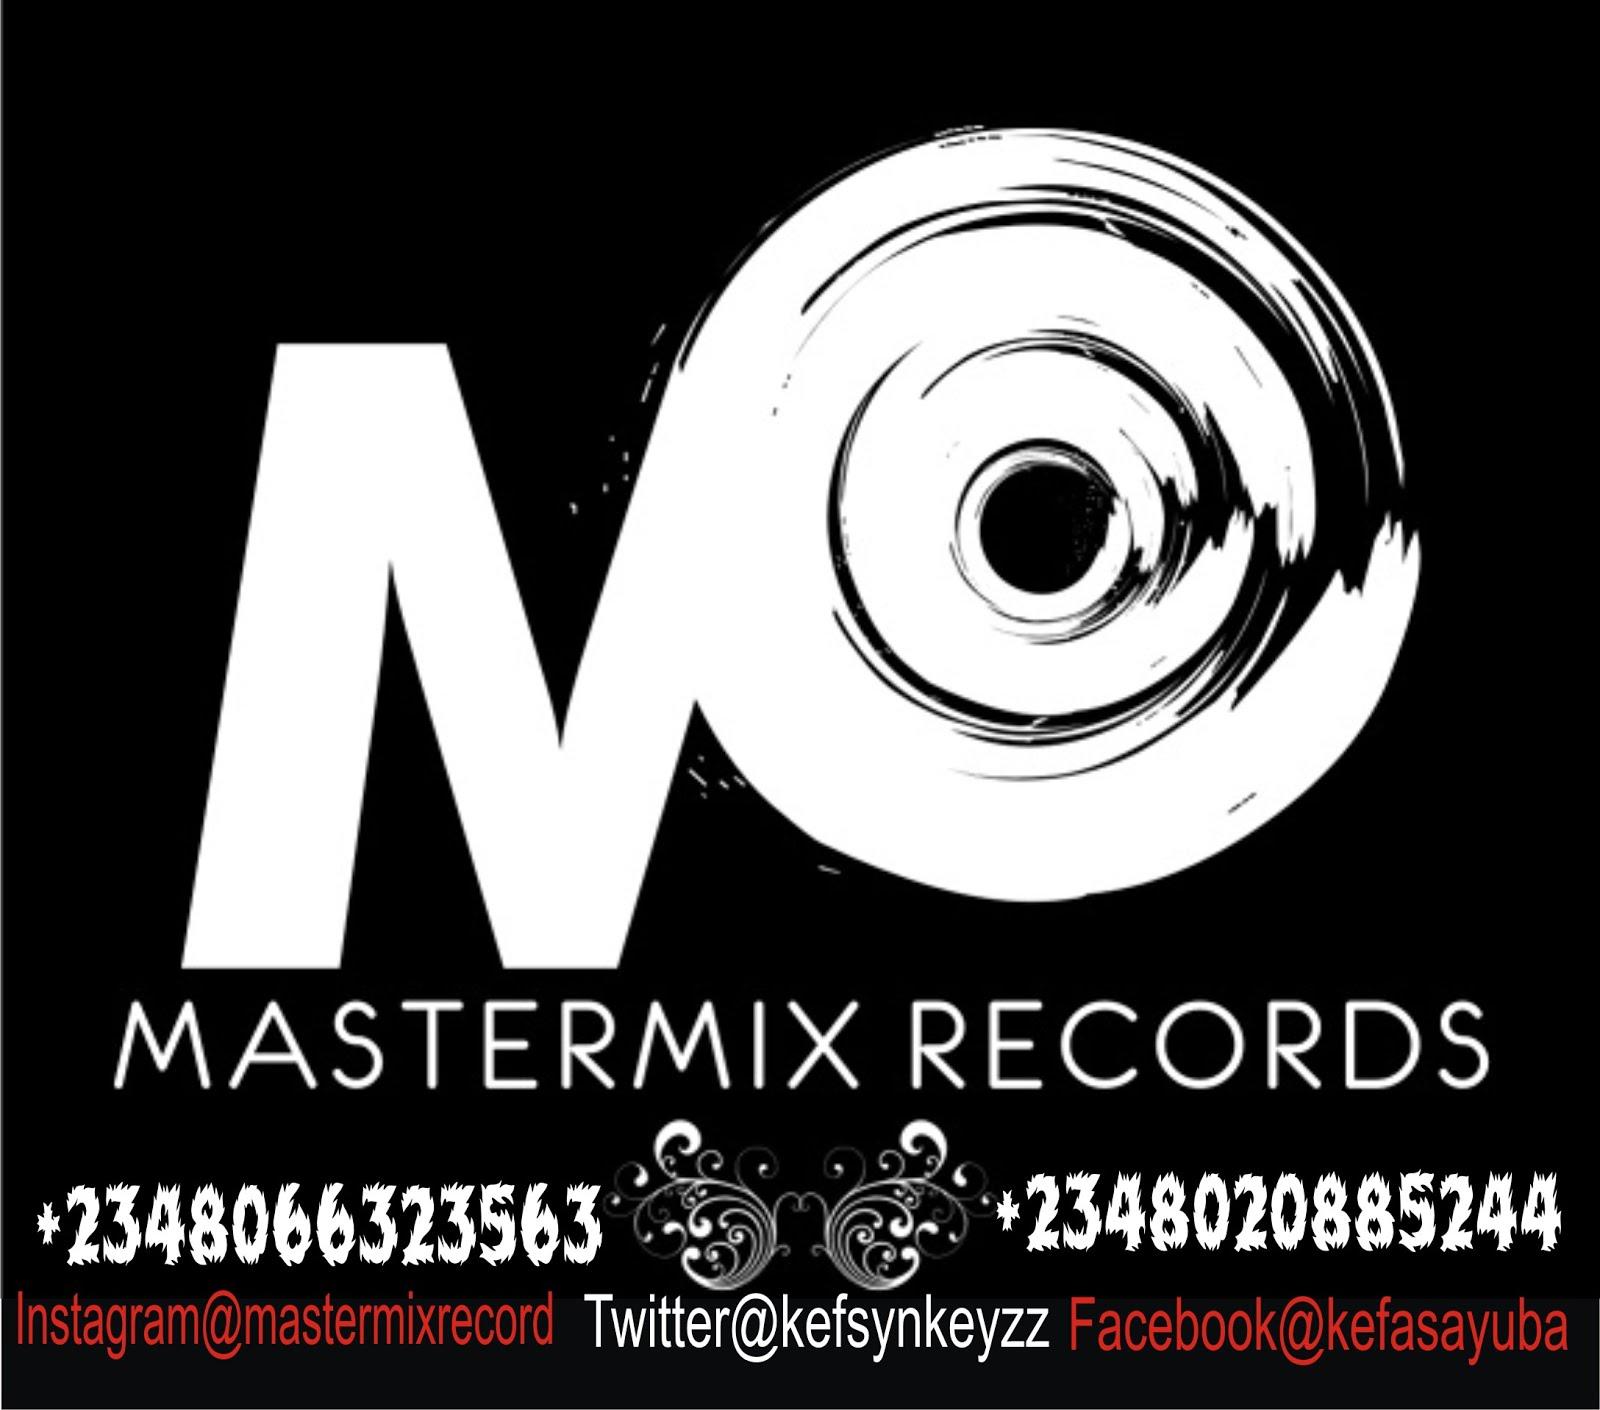 MASTERMIX RECORDS